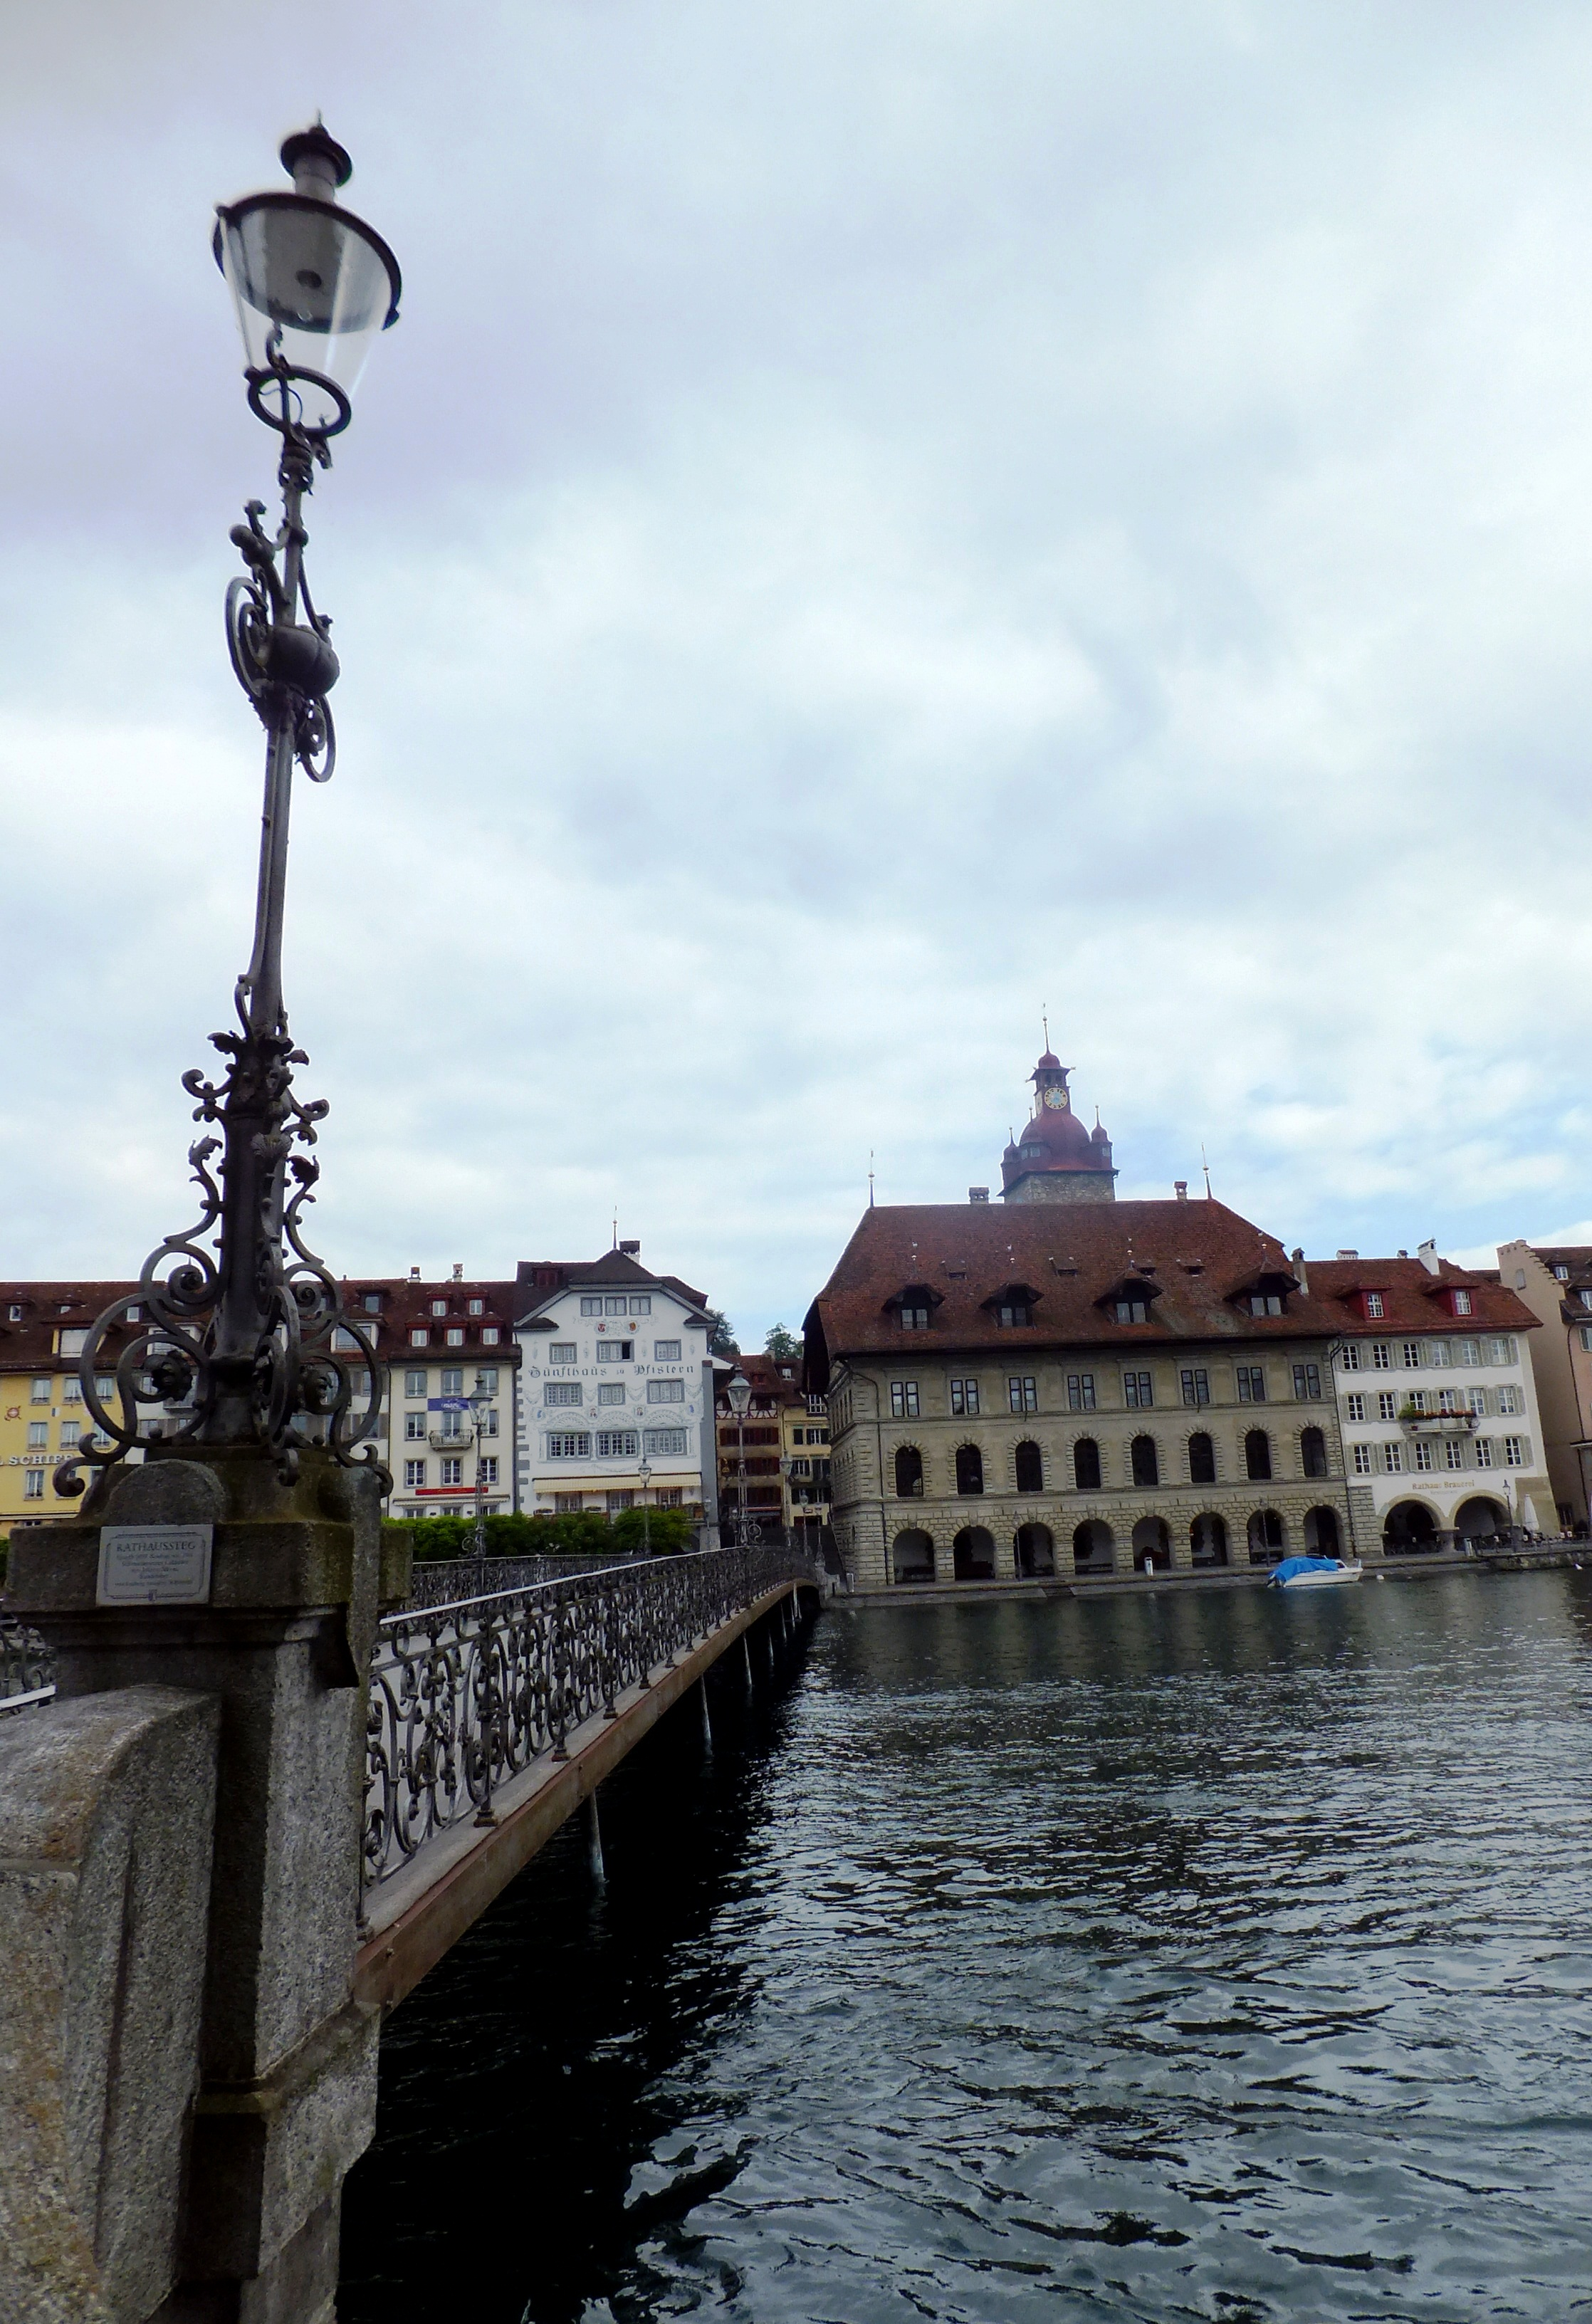 DSCF4118 Rathaus Bridge